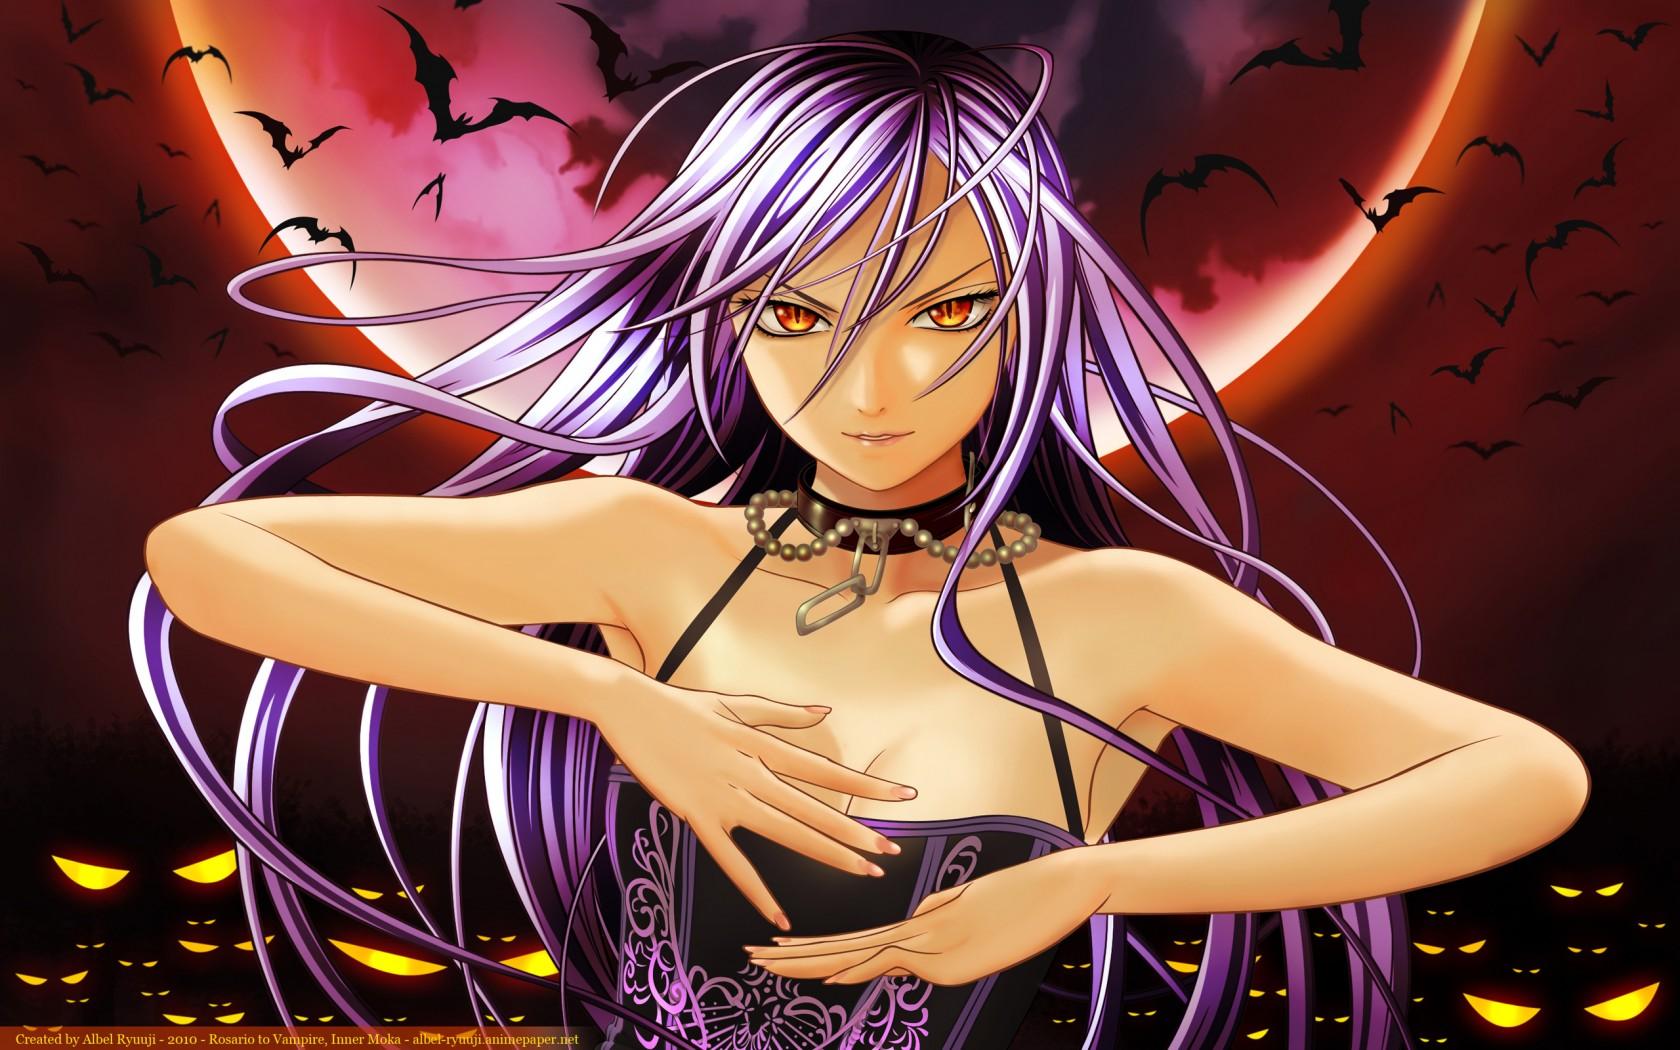 Rosario vampire babes nude nude tube